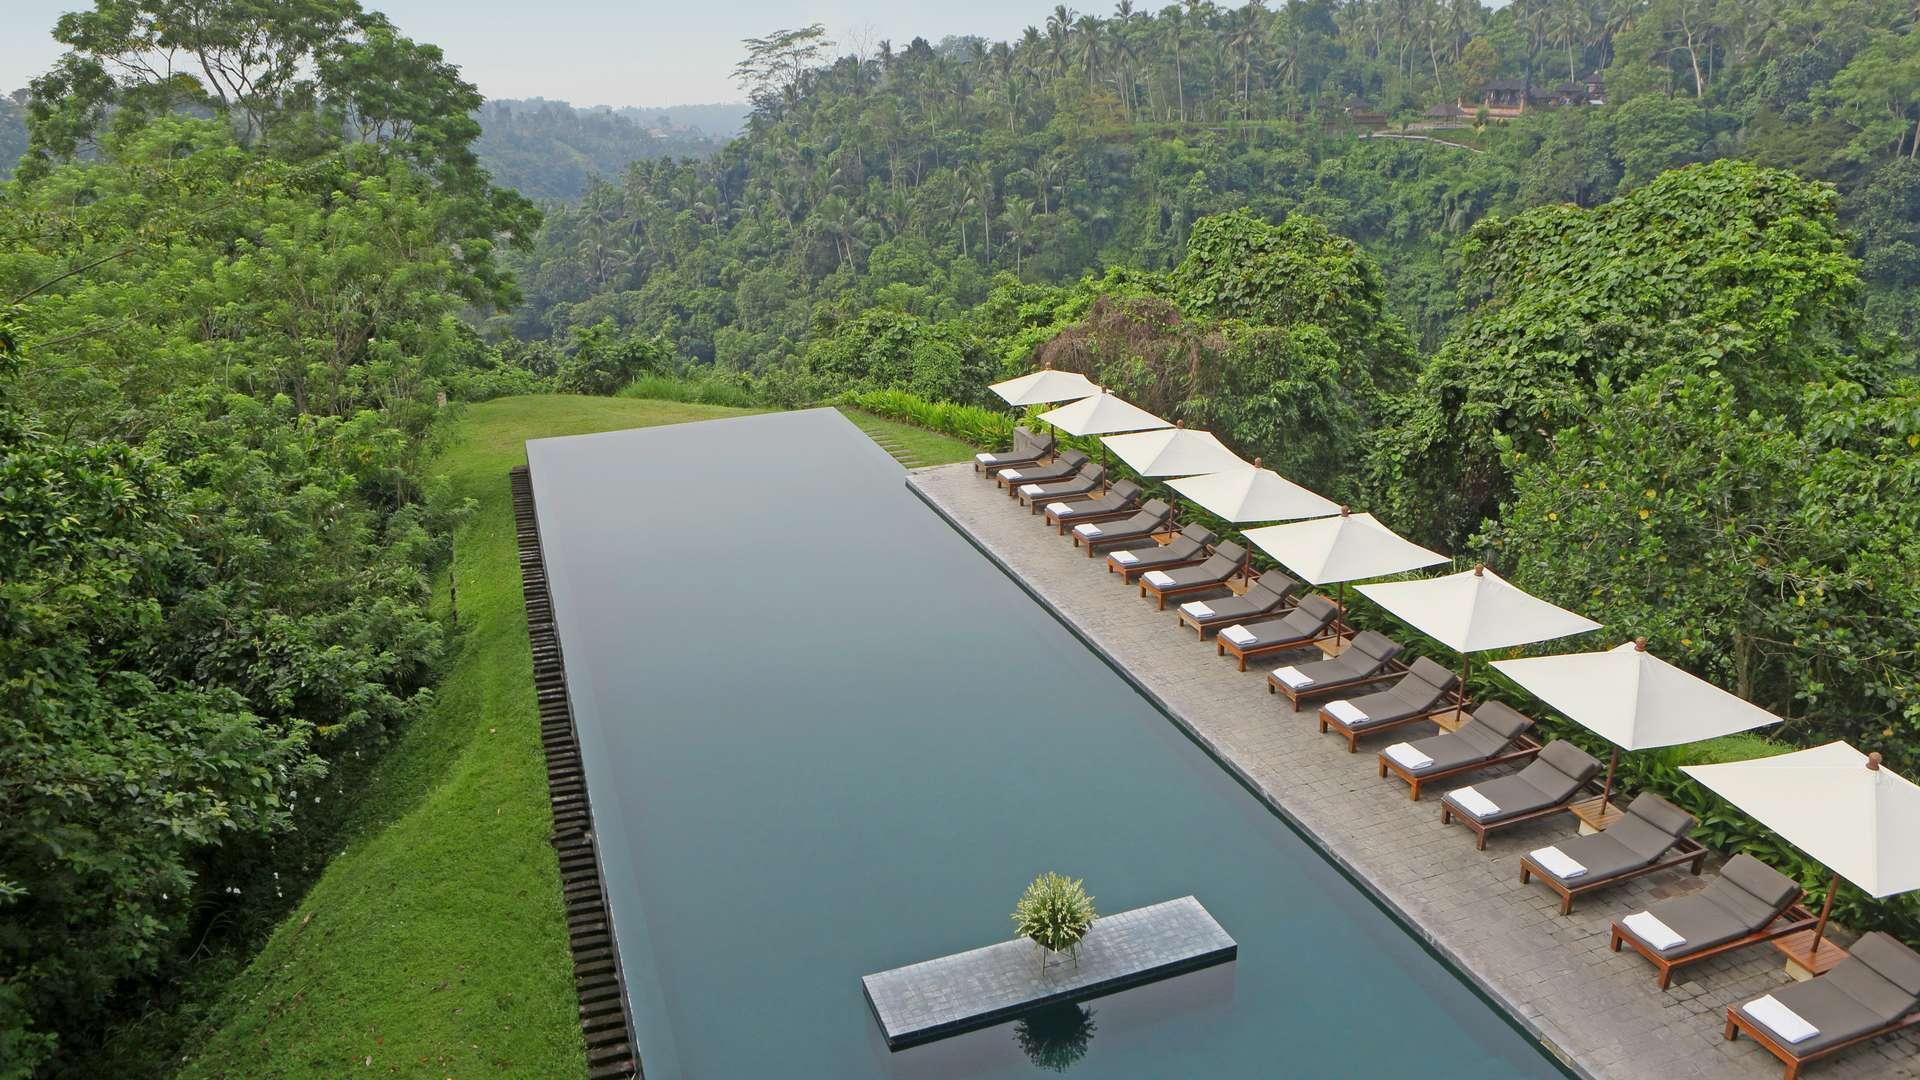 Alila Ubud A Kuoni Hotel In Bali